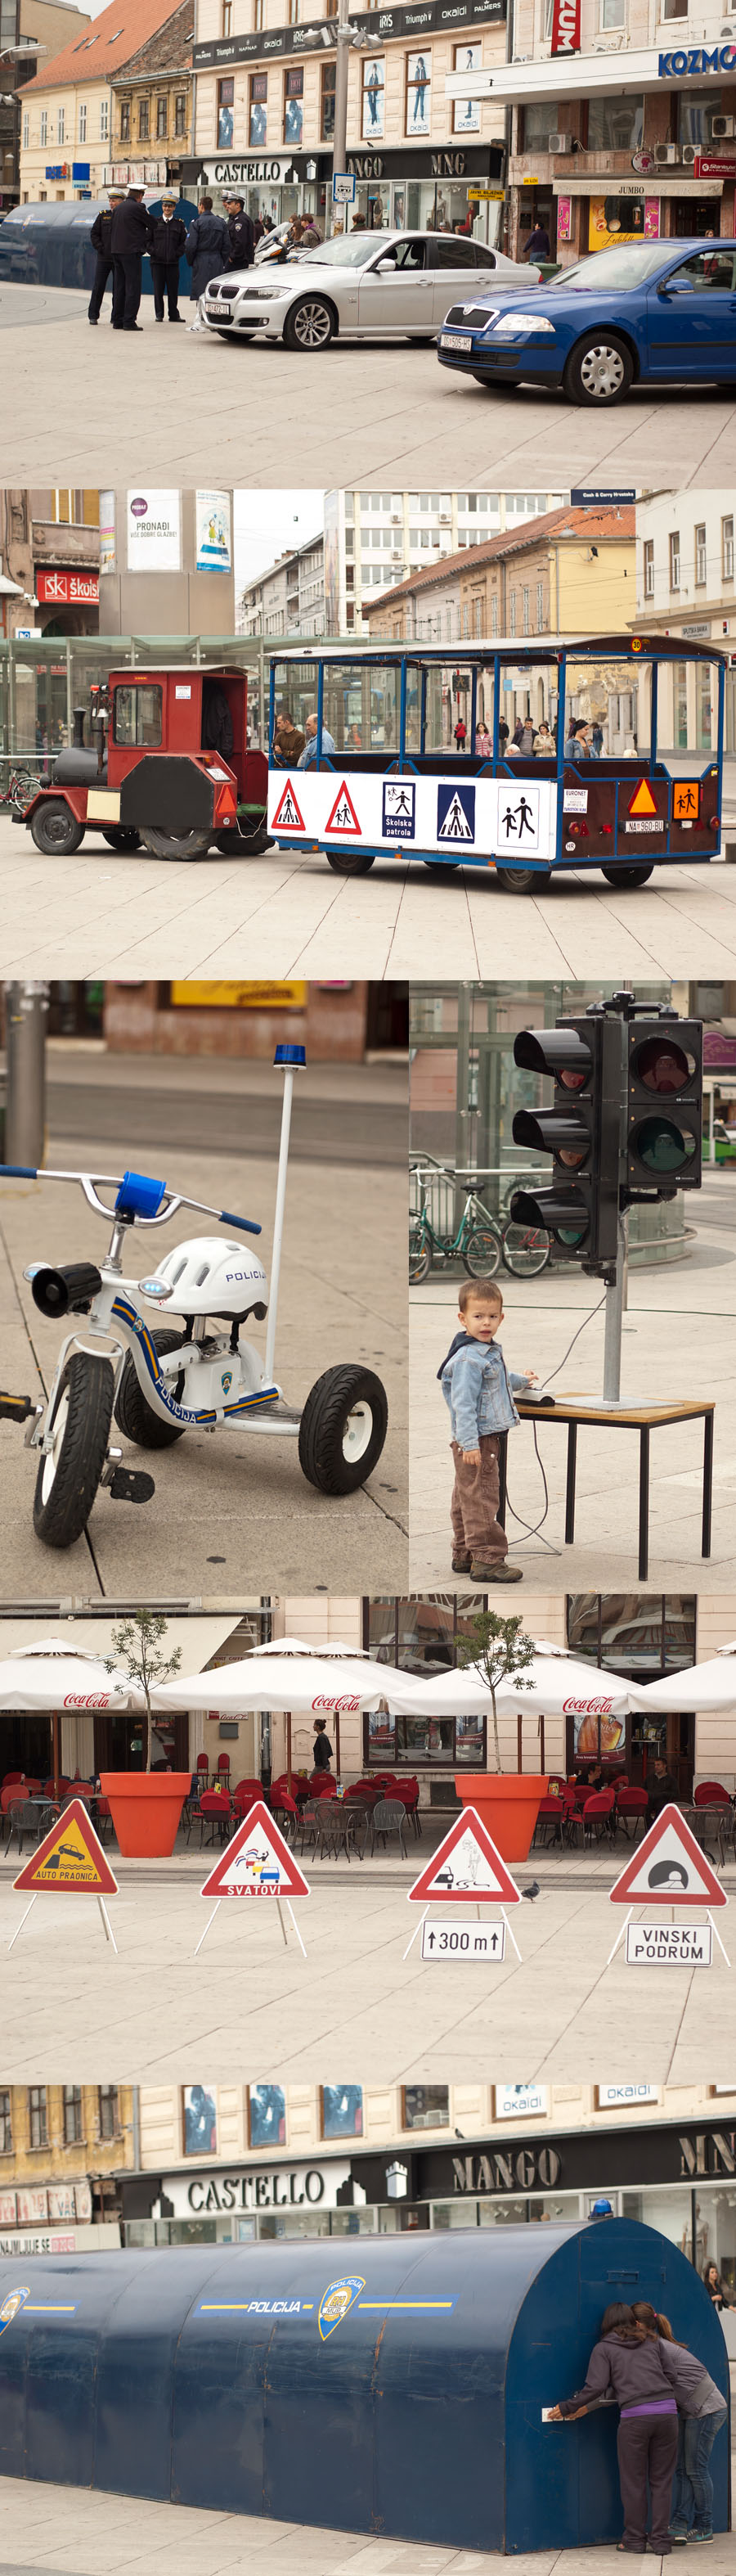 Poštujte naše znakove  foto: [b]Ante Delač[/b]  Ključne riječi: trg mup prezentacija prometni znakovi